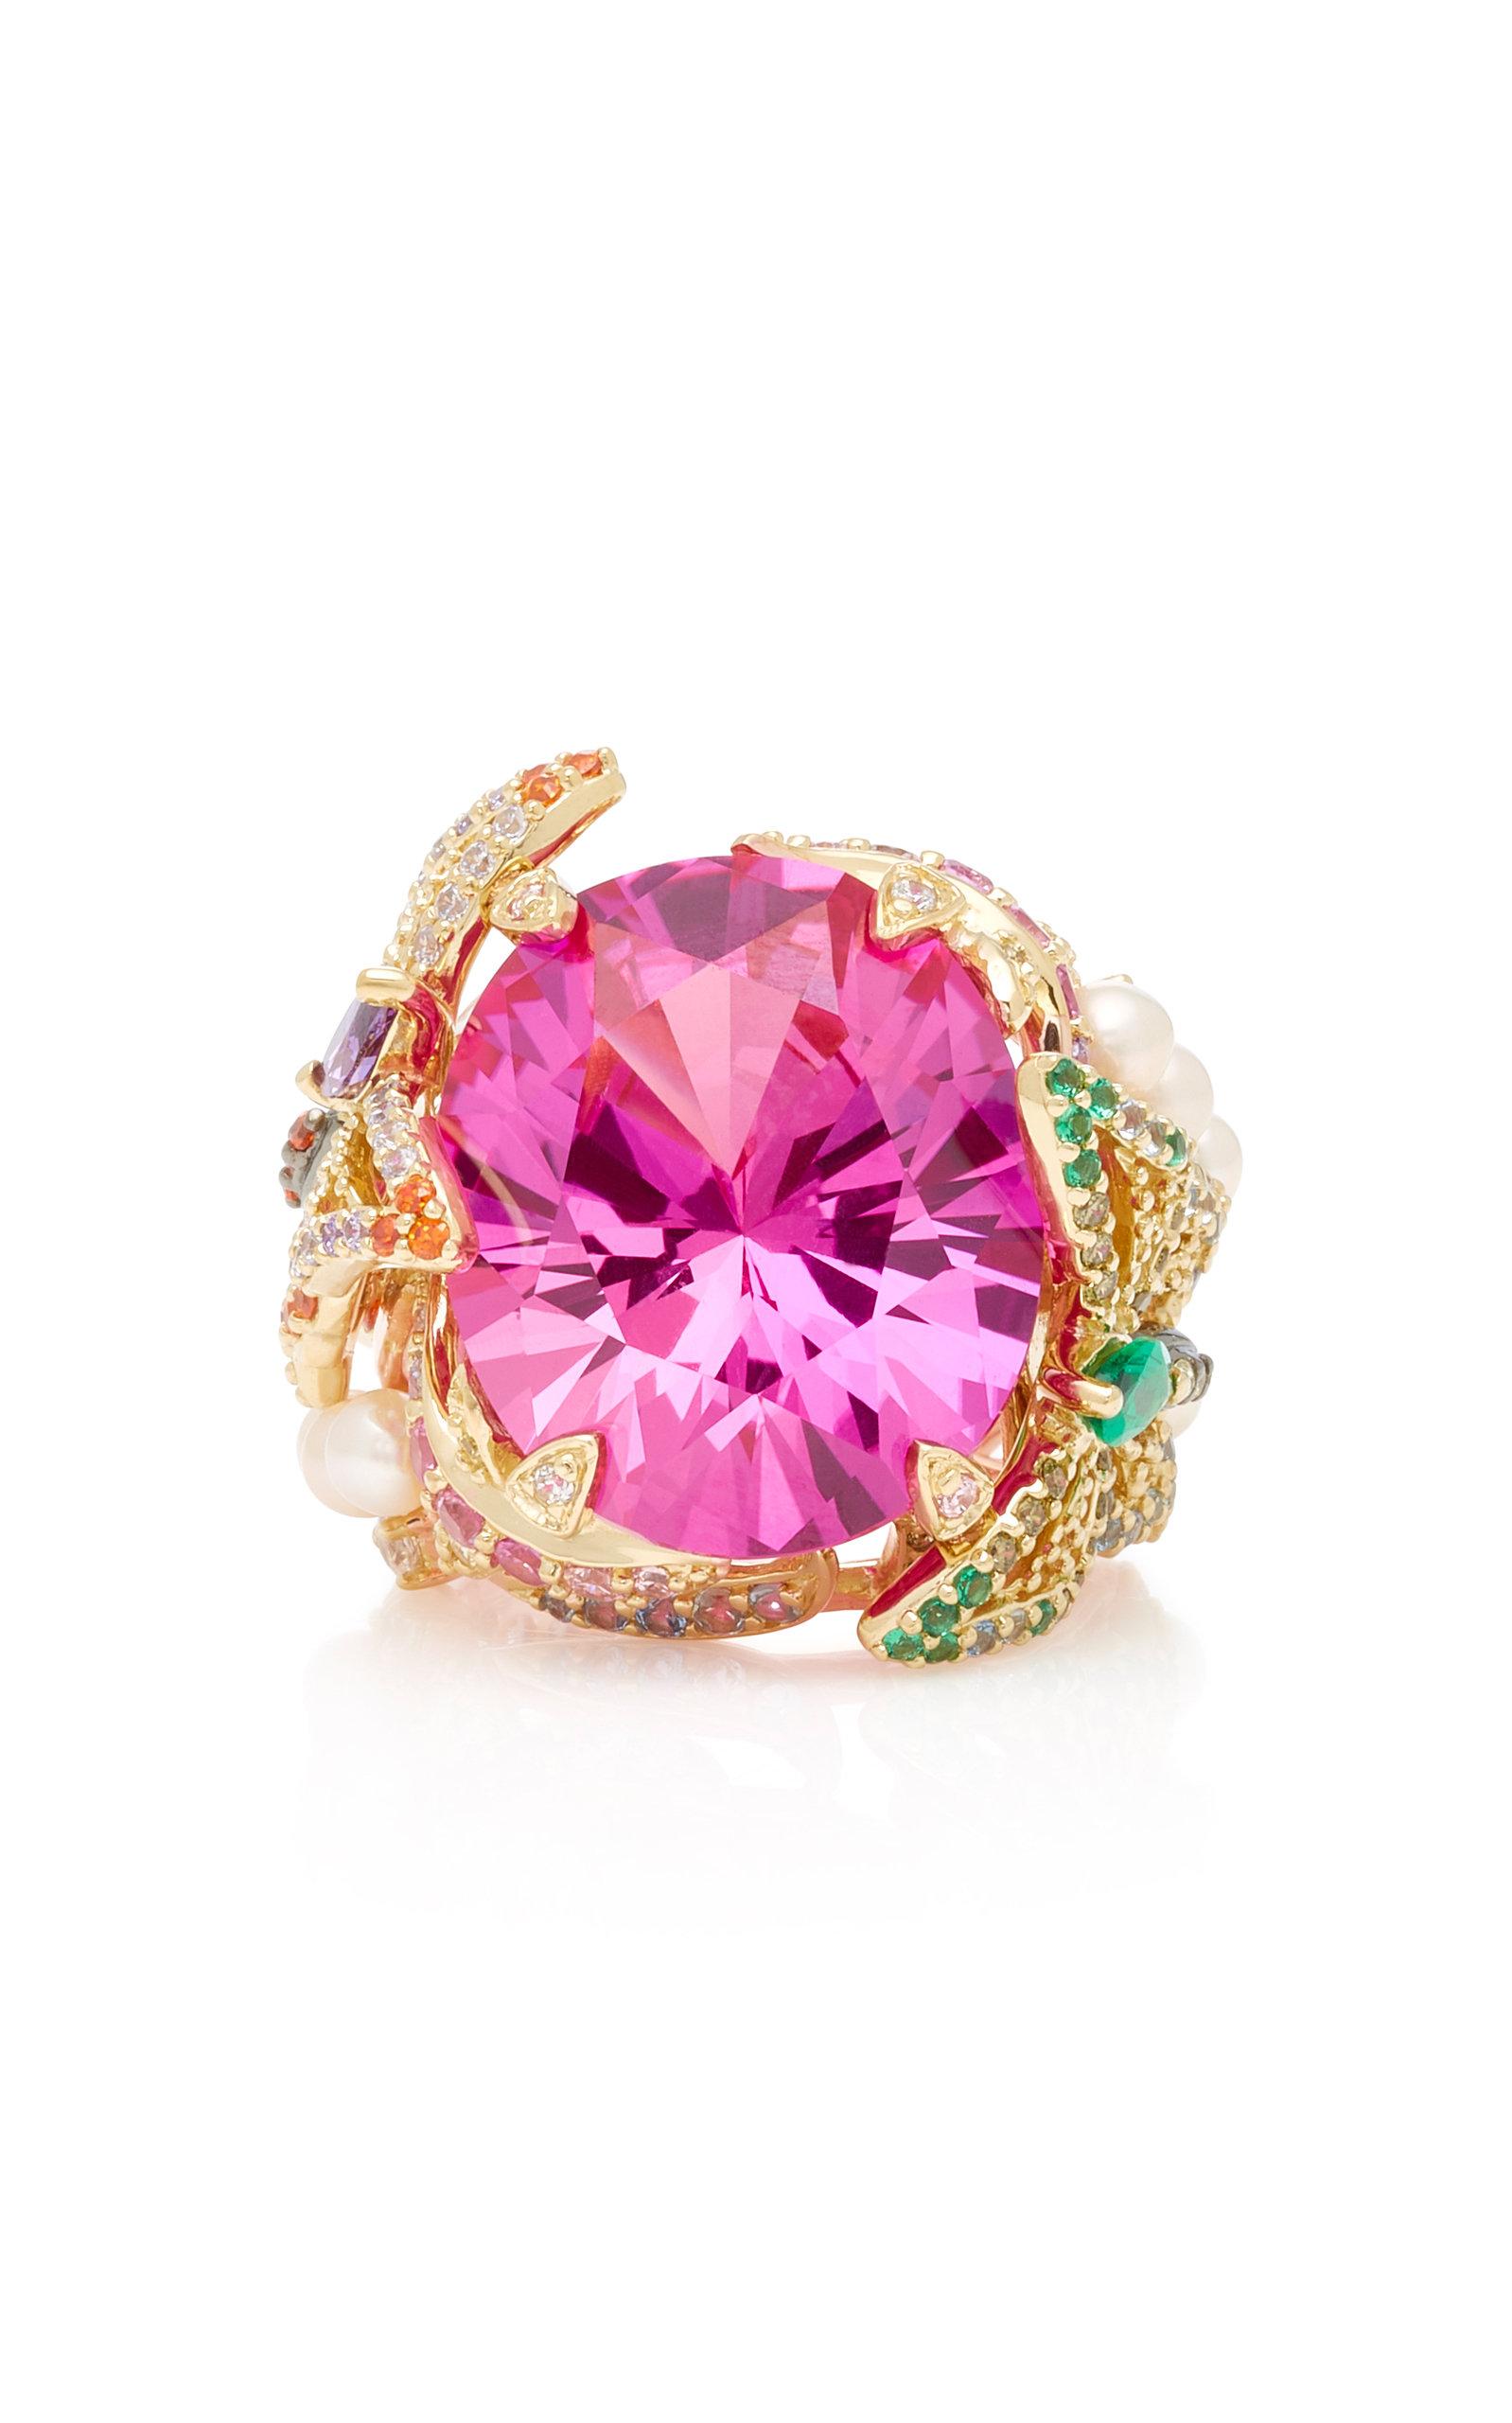 ANABELA CHAN ROSE SWALLOWTAIL PINK SAPPHIRE RING